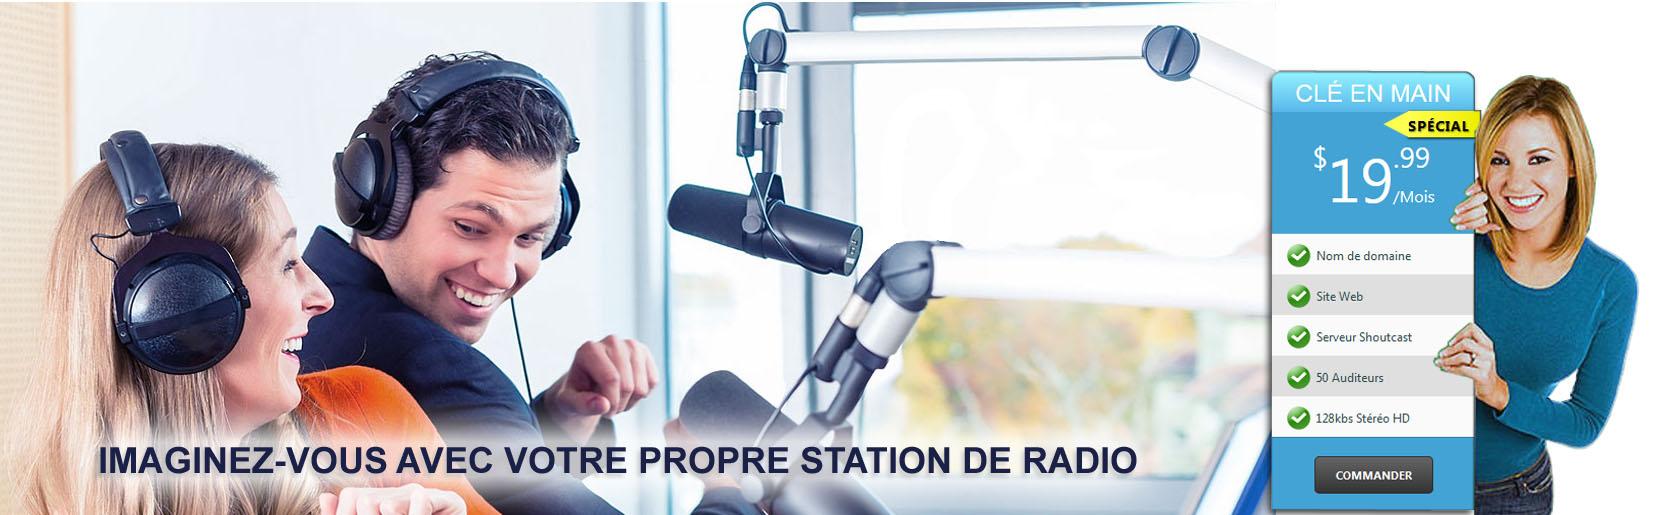 Location Radio Web au Mois